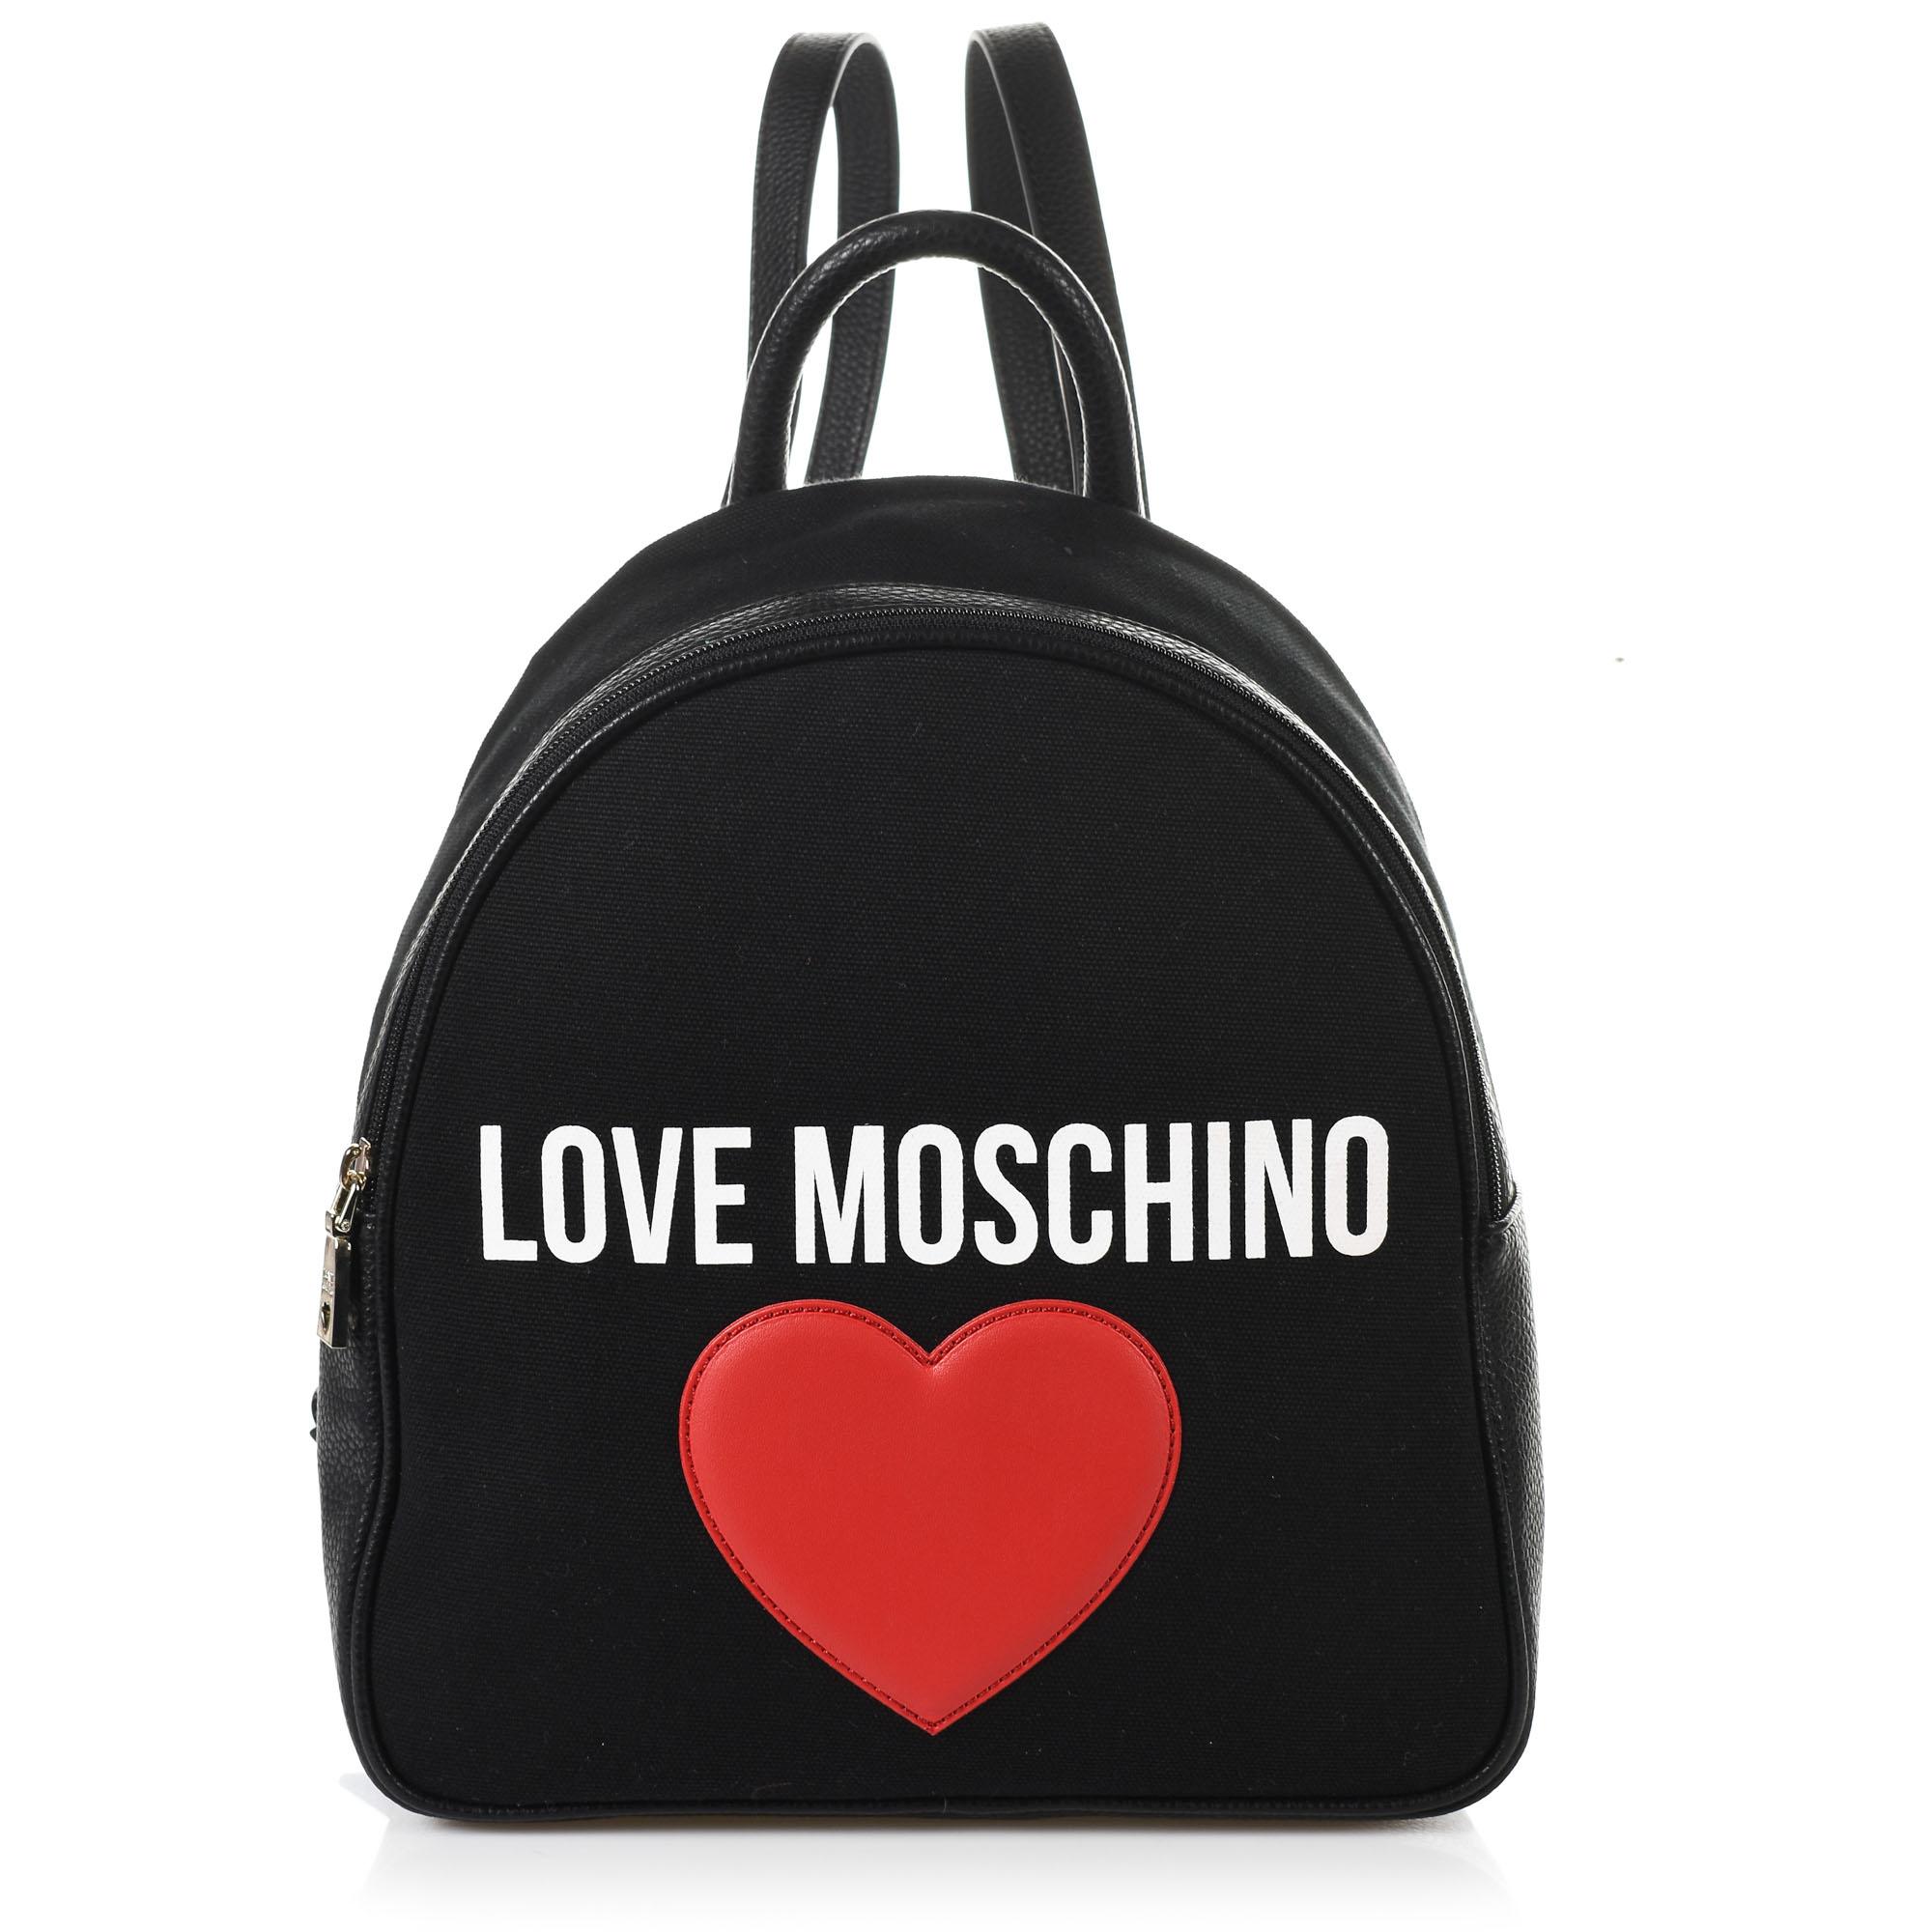 76b7078f12 Σακίδιο Πλάτης Love Moschino Borsa Canvas+ Pebble JC4331PP07KV